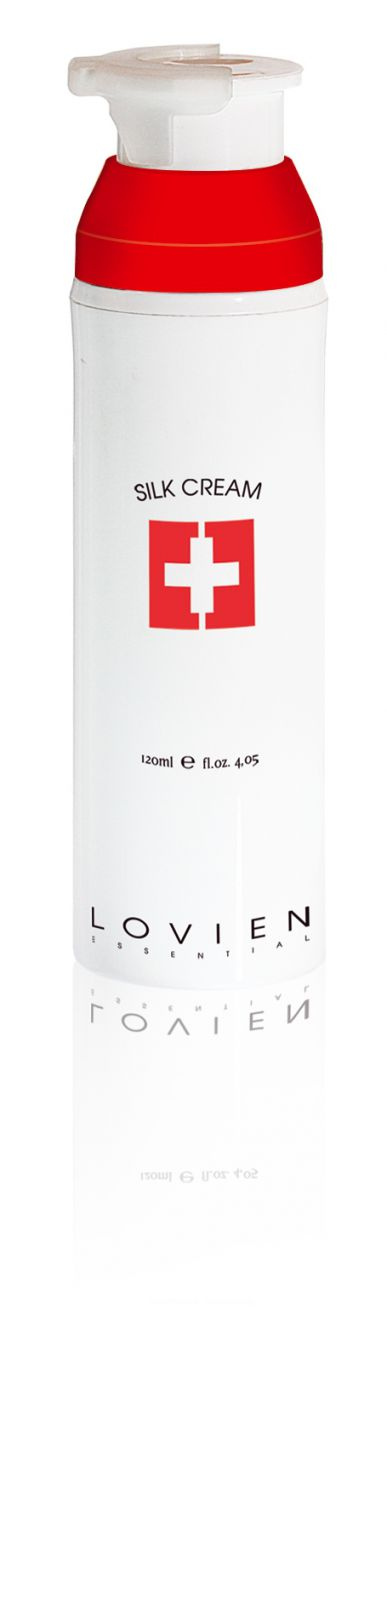 Lovien Silk Cream 120ml - fluid na vlasy - Fluid pro posilnění vlasů.